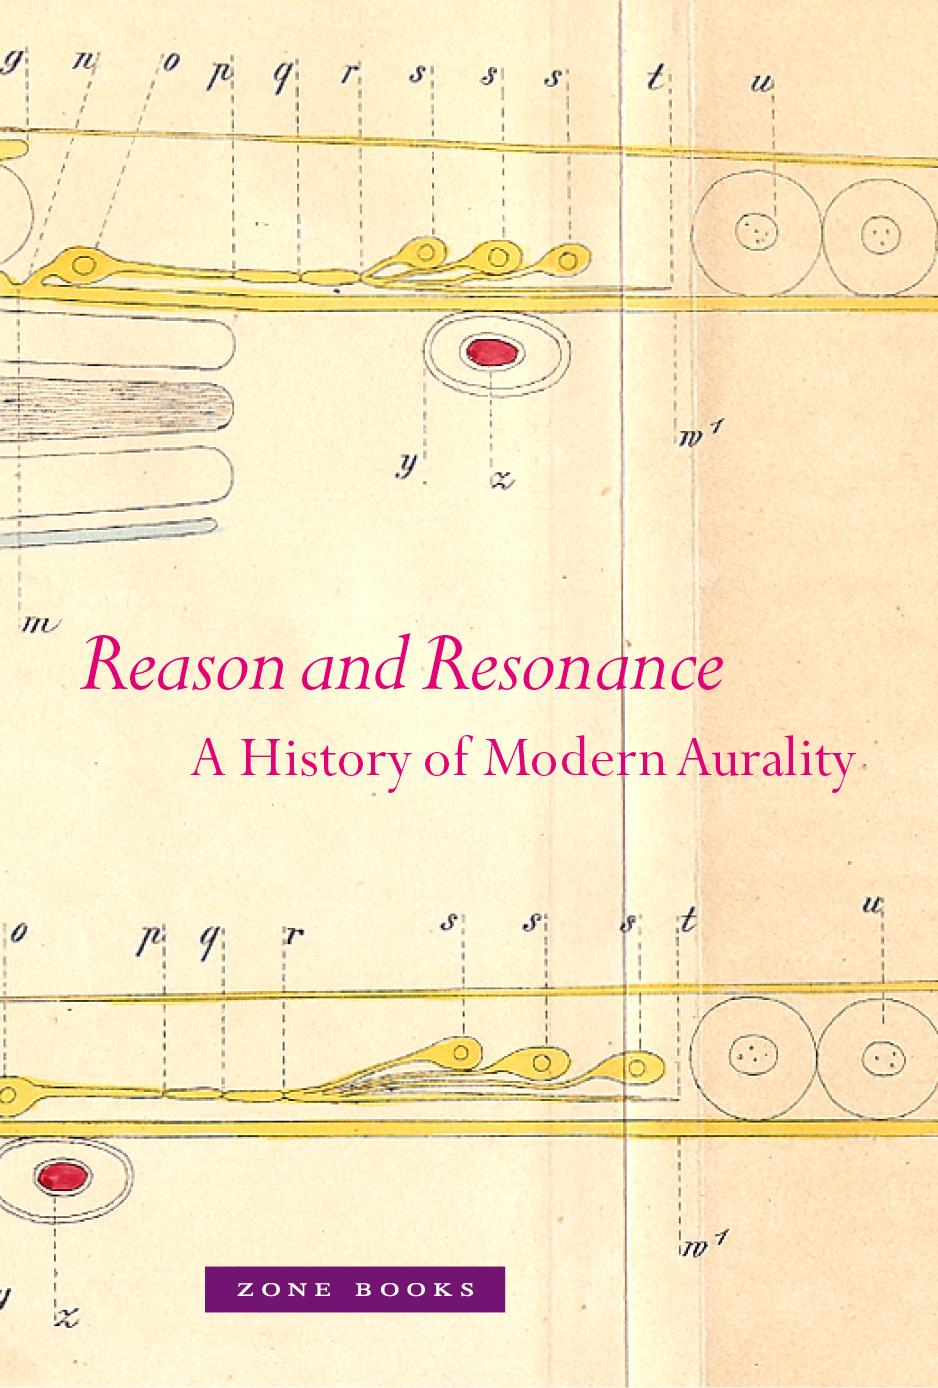 Erlmann V. Reason and Resonance: A History of Modern Aurality. N.Y.: Zone Books, 2010.